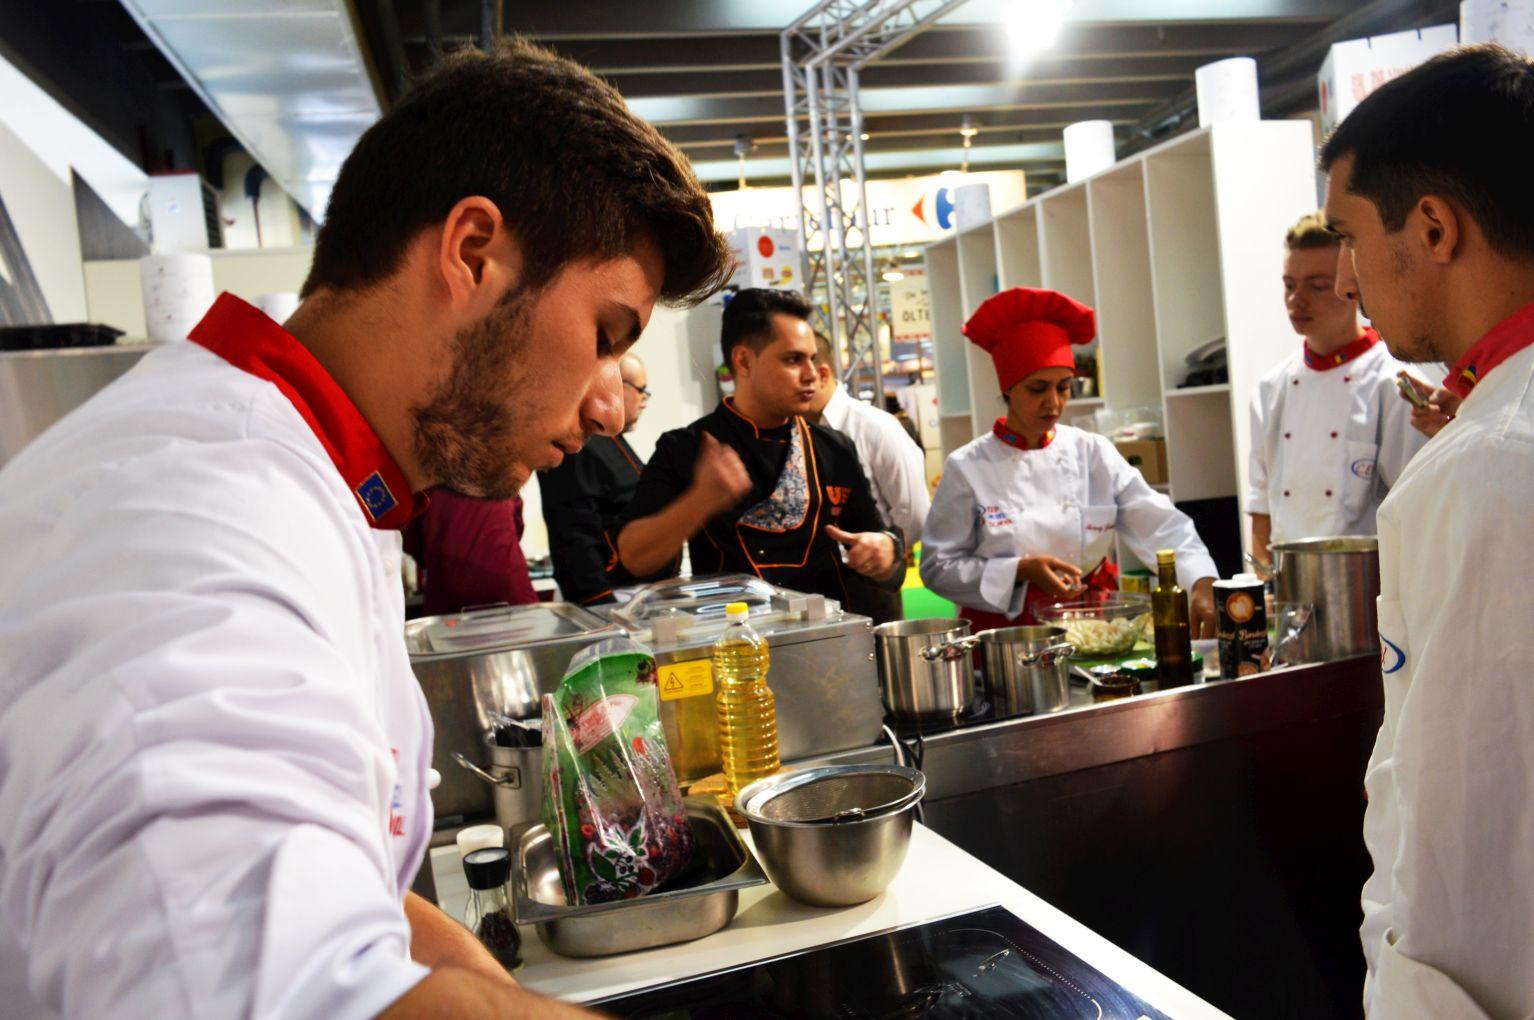 Sarbatoarea-Gustului-Indagra-Unilever-Food-Solution-Chef-Robert-si-Chef-Laszlo-04